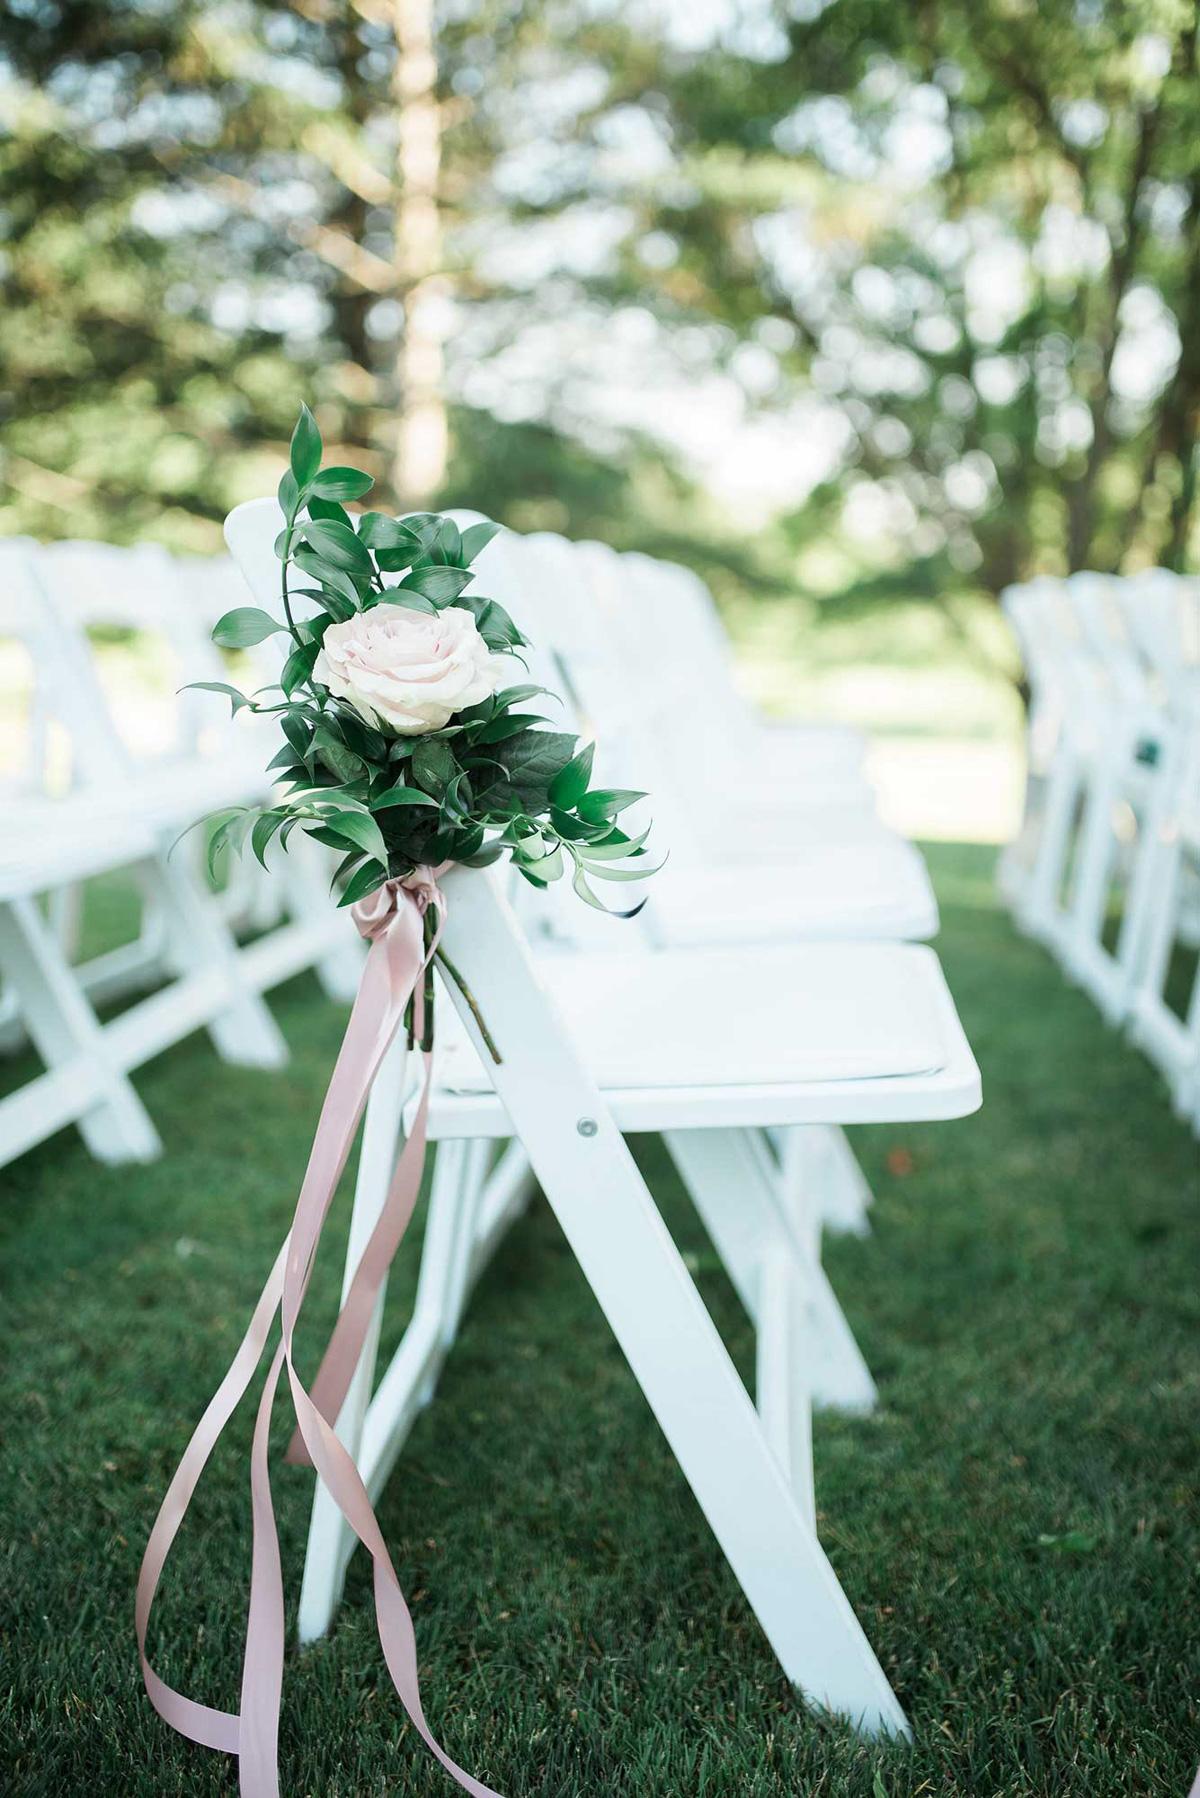 destiny-dawn-photography-vineyard-bride-swish-list-knollwood-golf-and-country-club-ancaster-wedding-editorial-14.jpg